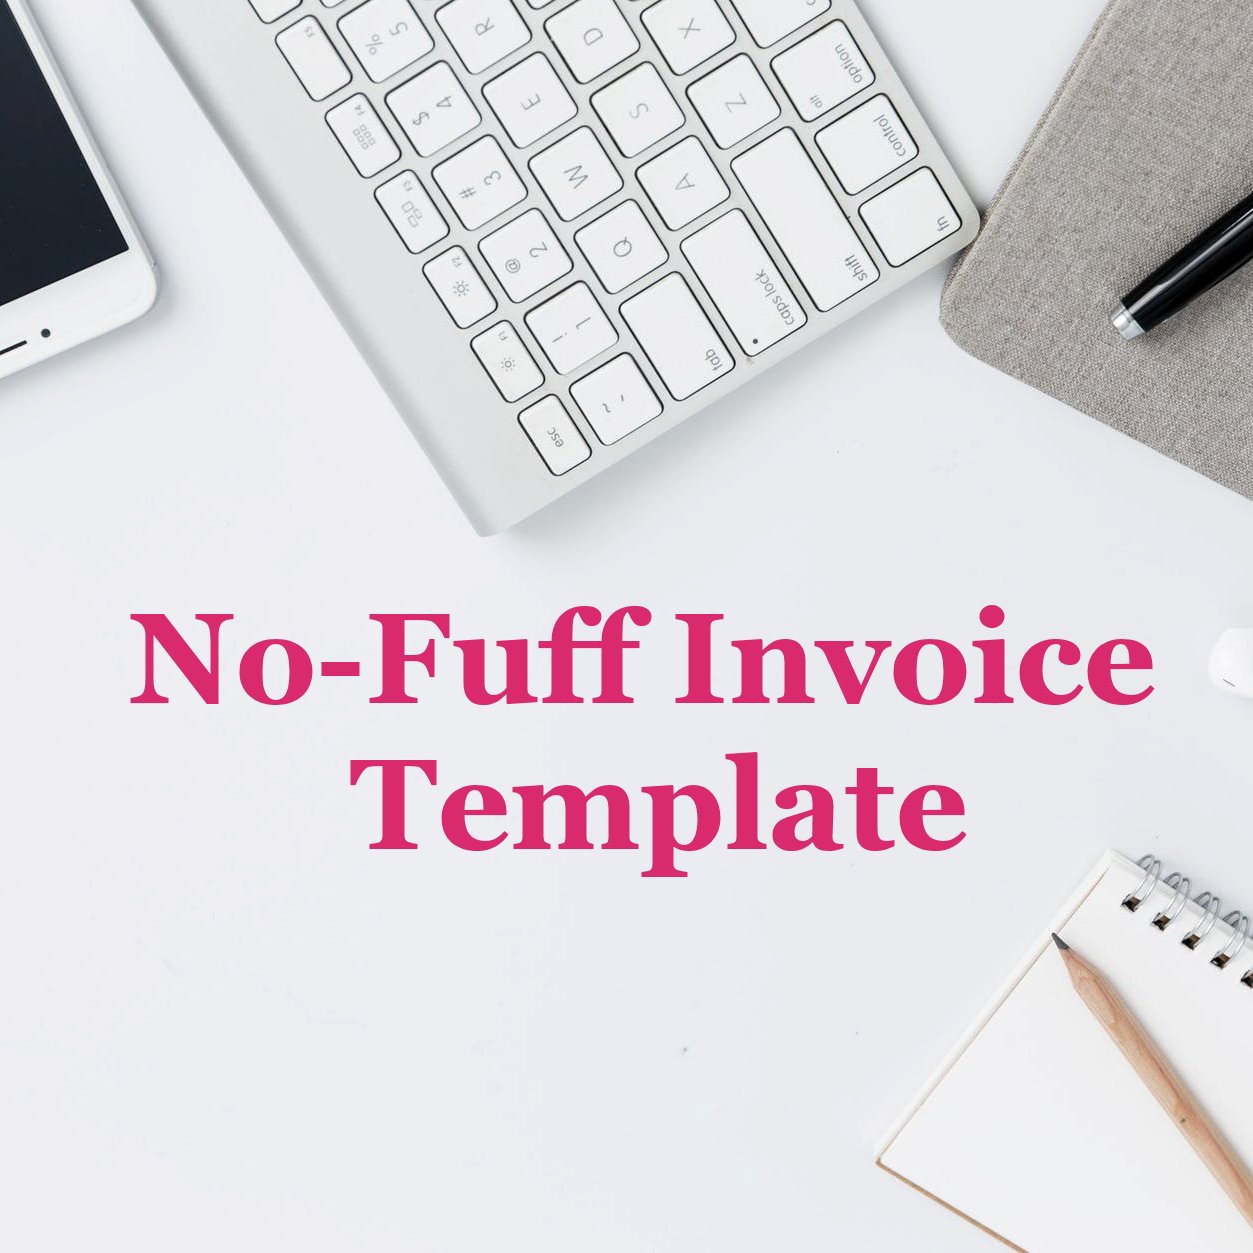 No-Fuff Invoice Template.jpeg